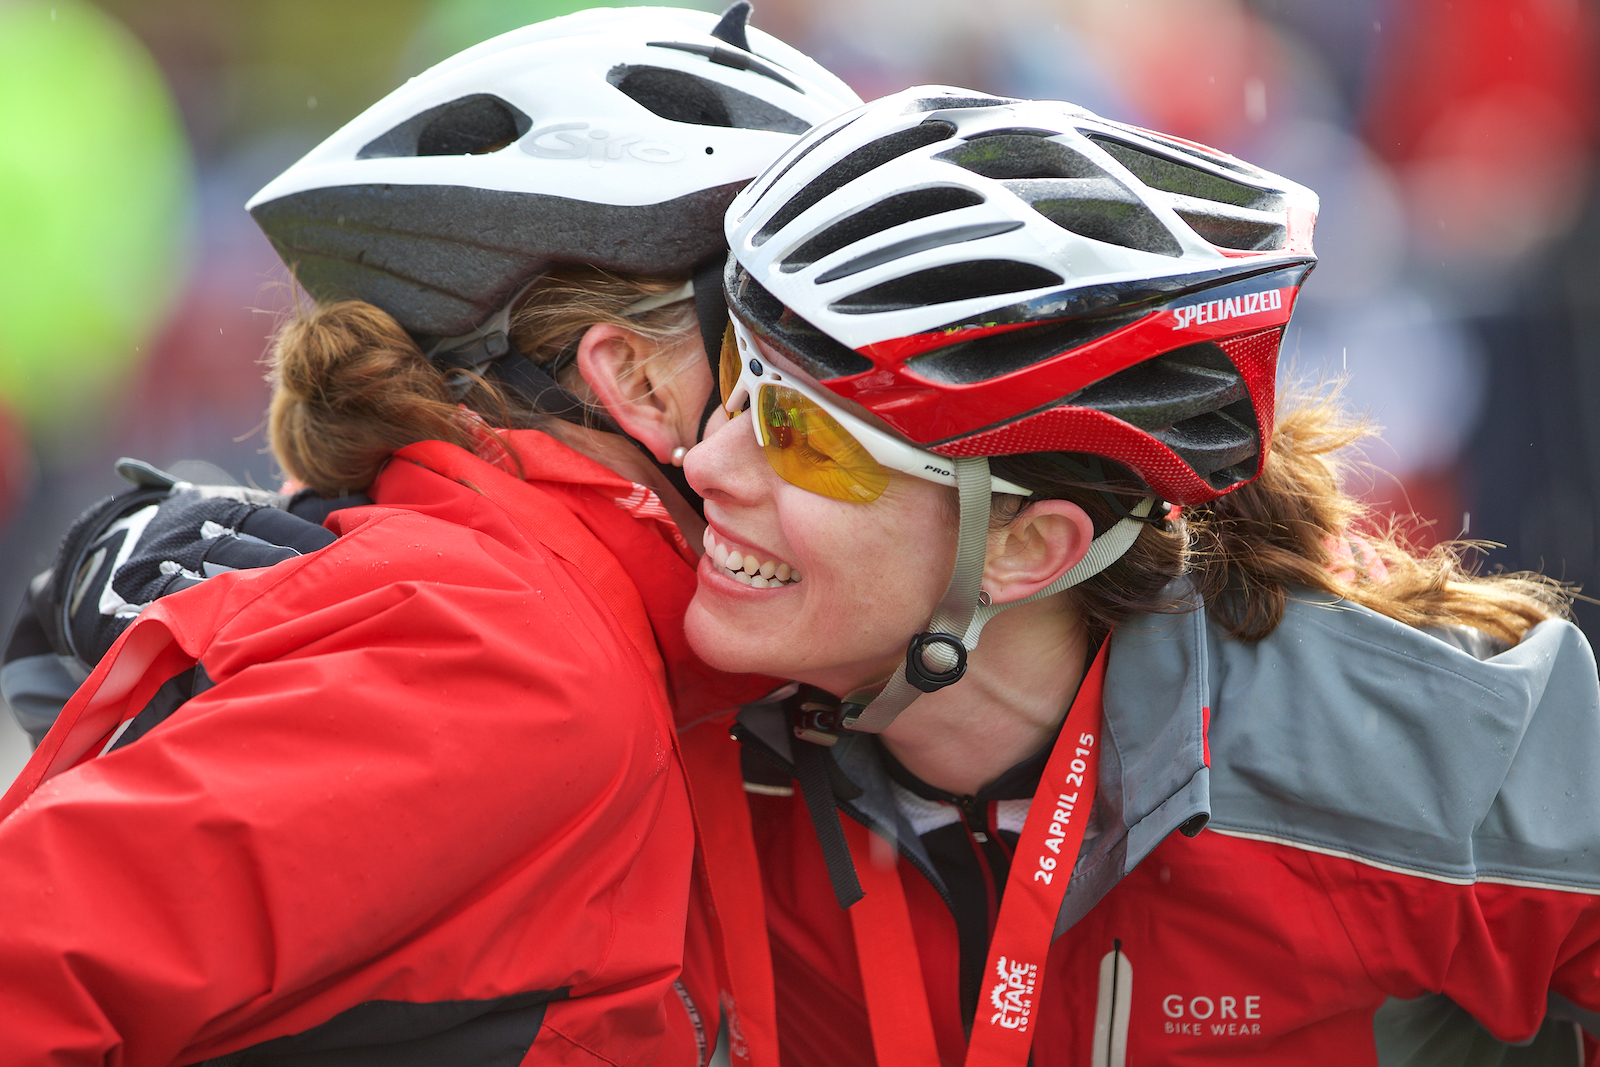 etape loch ness 2015 high res 2383